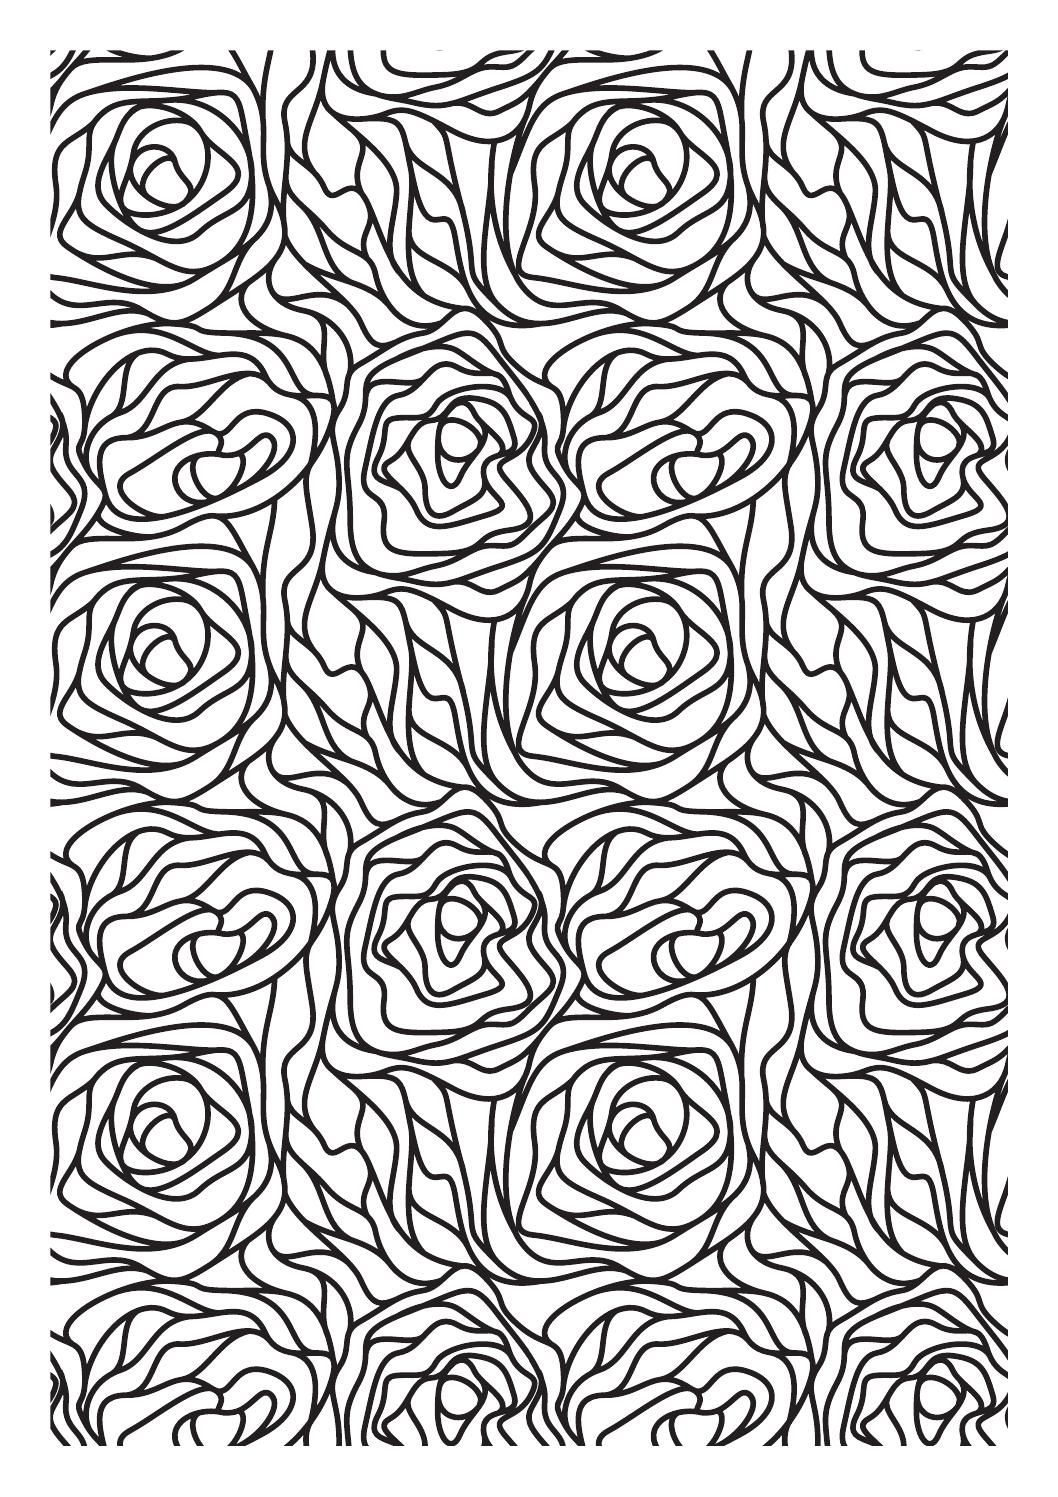 veli anstvena bojanka za odrasle klikaj coloring floral coloring books books curtains. Black Bedroom Furniture Sets. Home Design Ideas